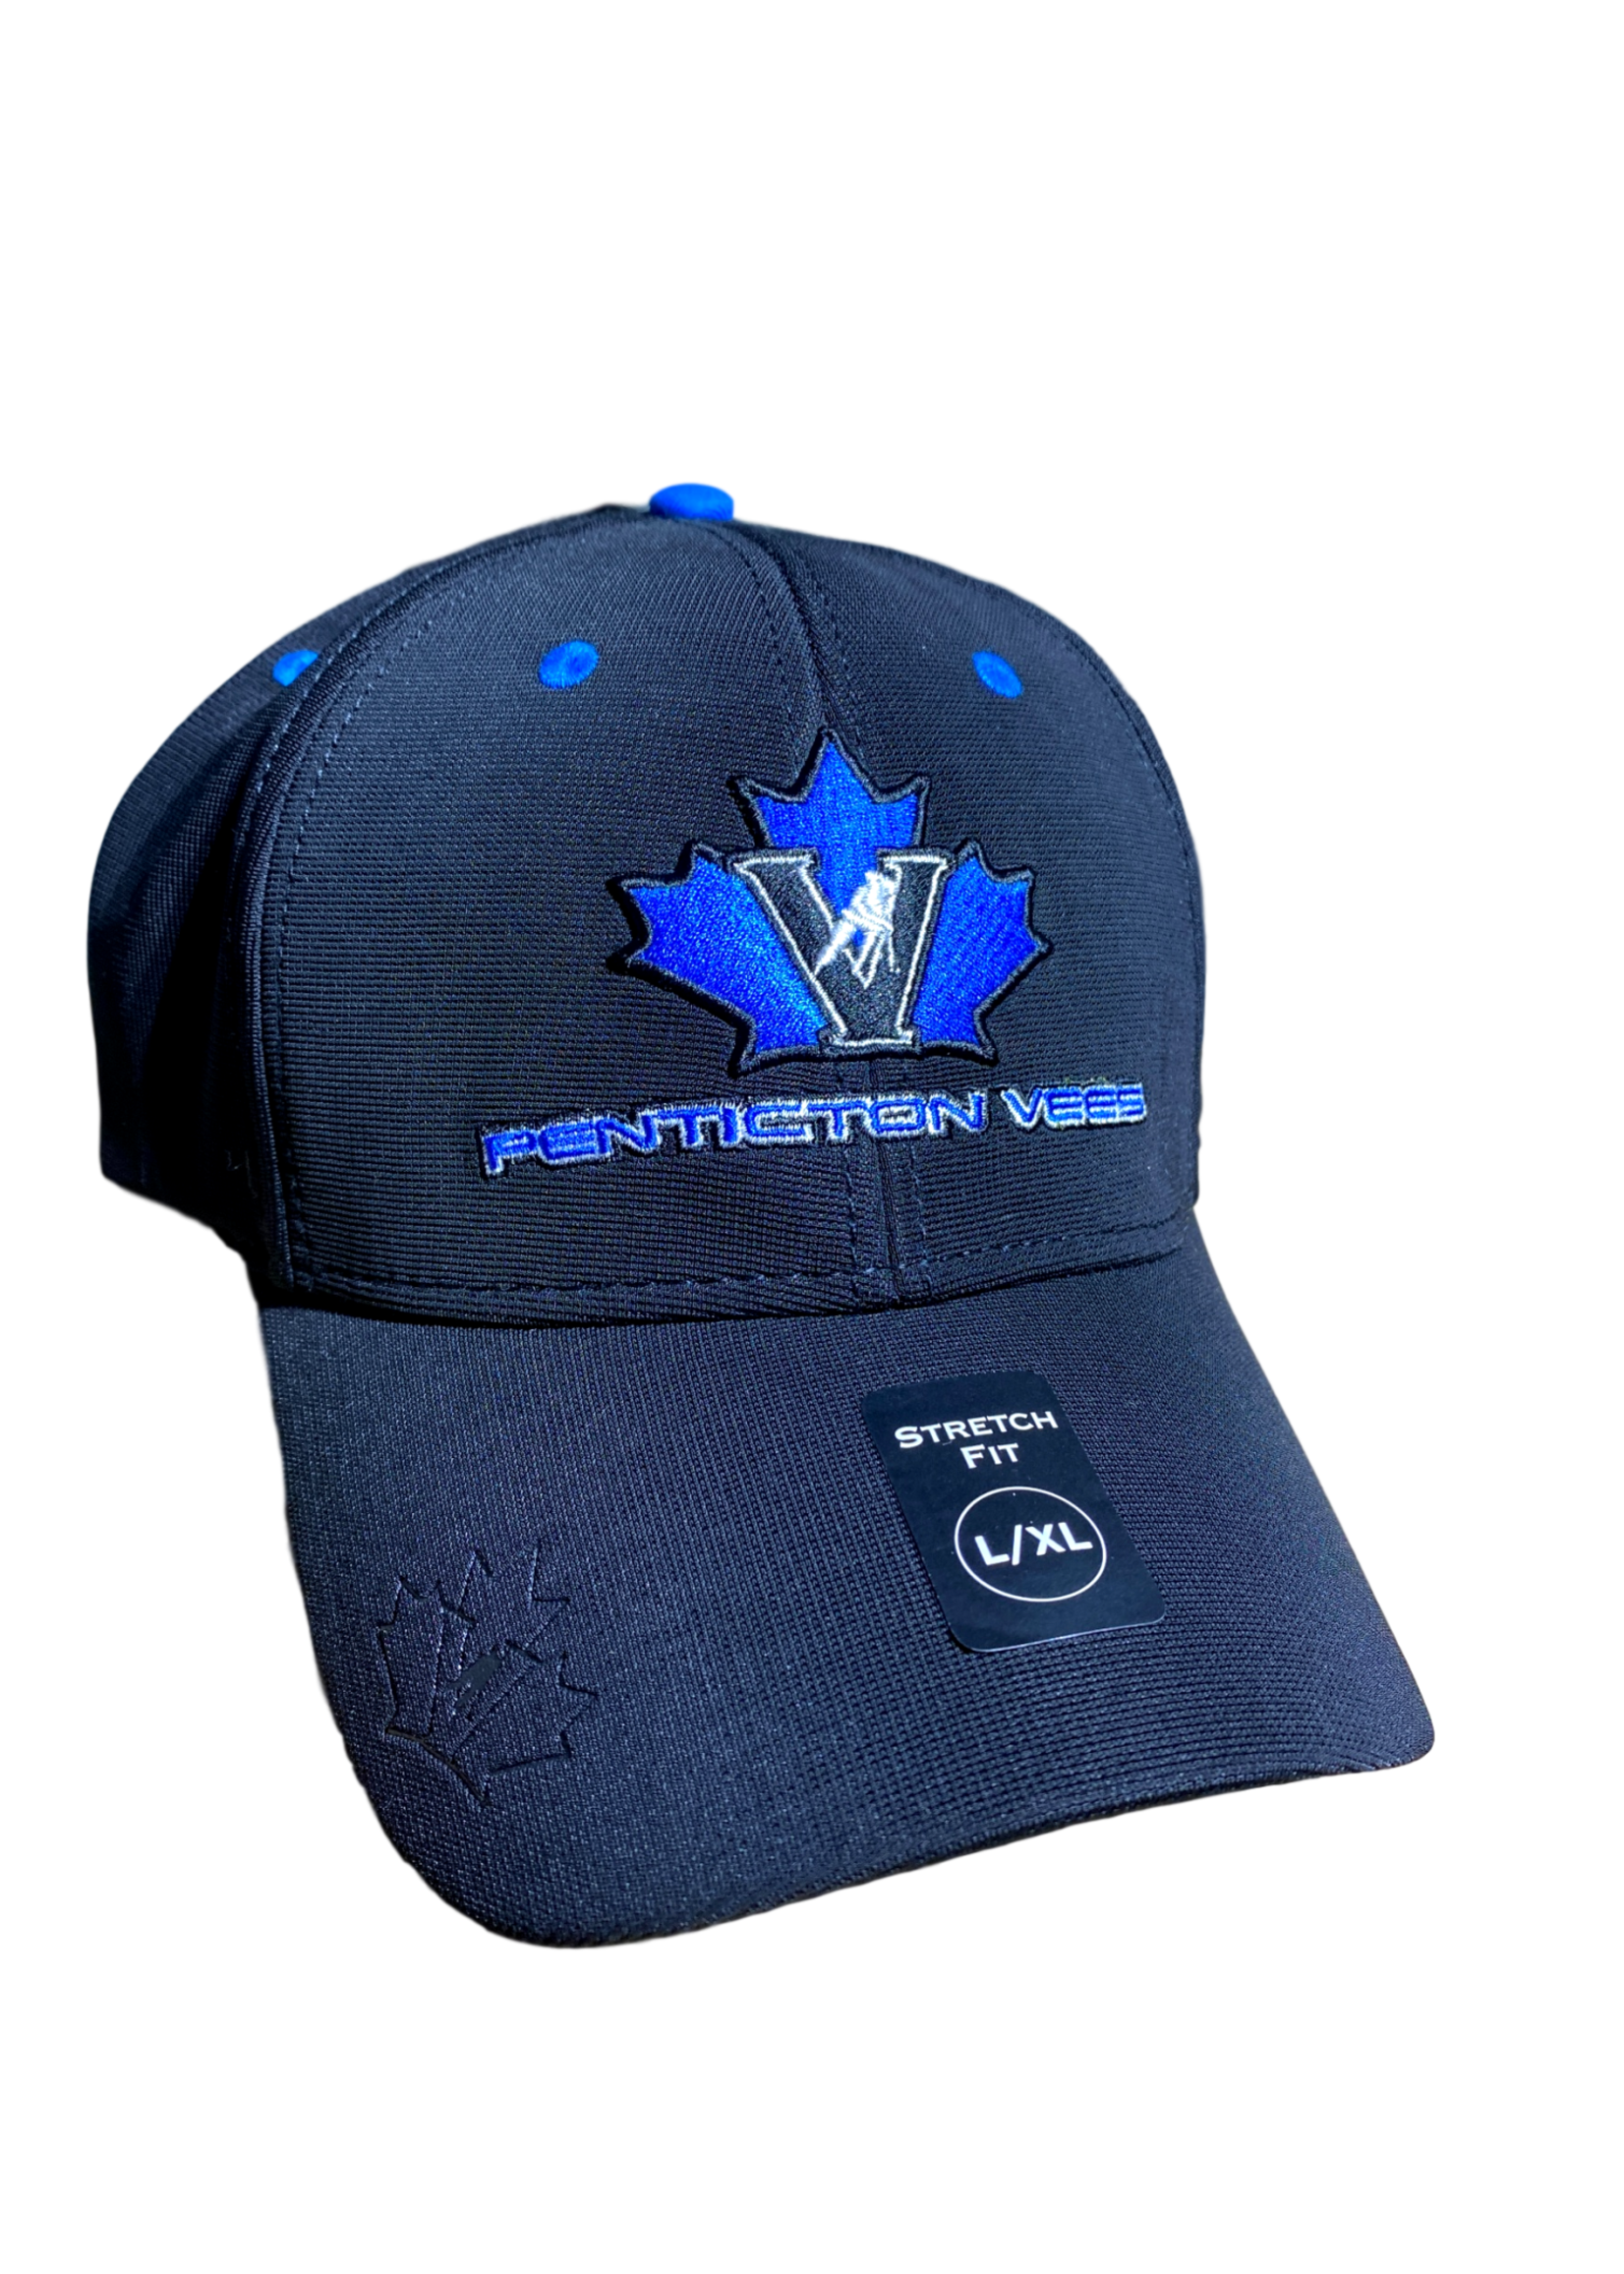 American Needle Eboss stretch Hat Flex Fit